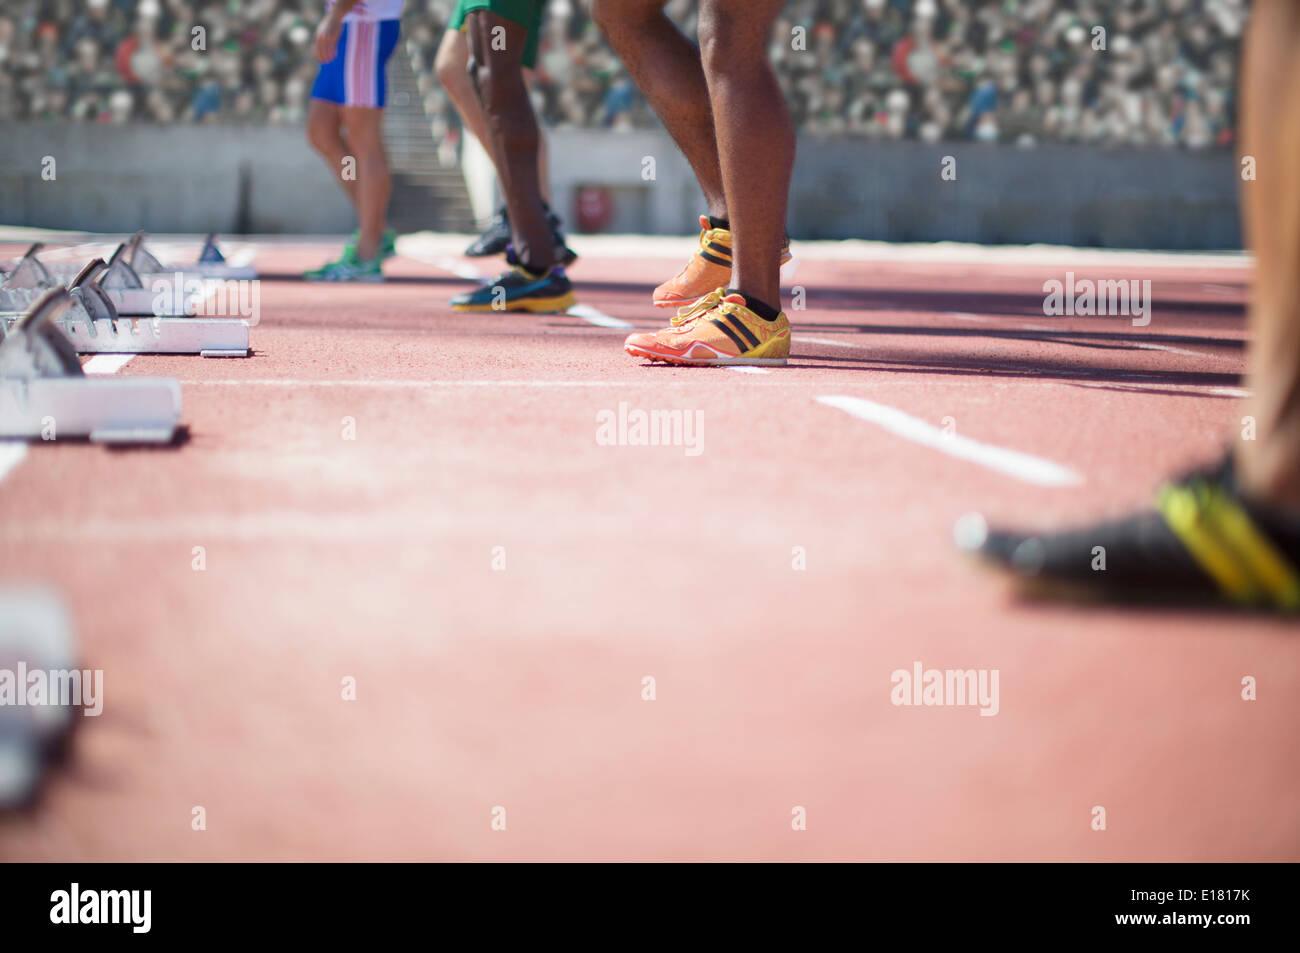 Runners standing at starting blocks on track - Stock Image